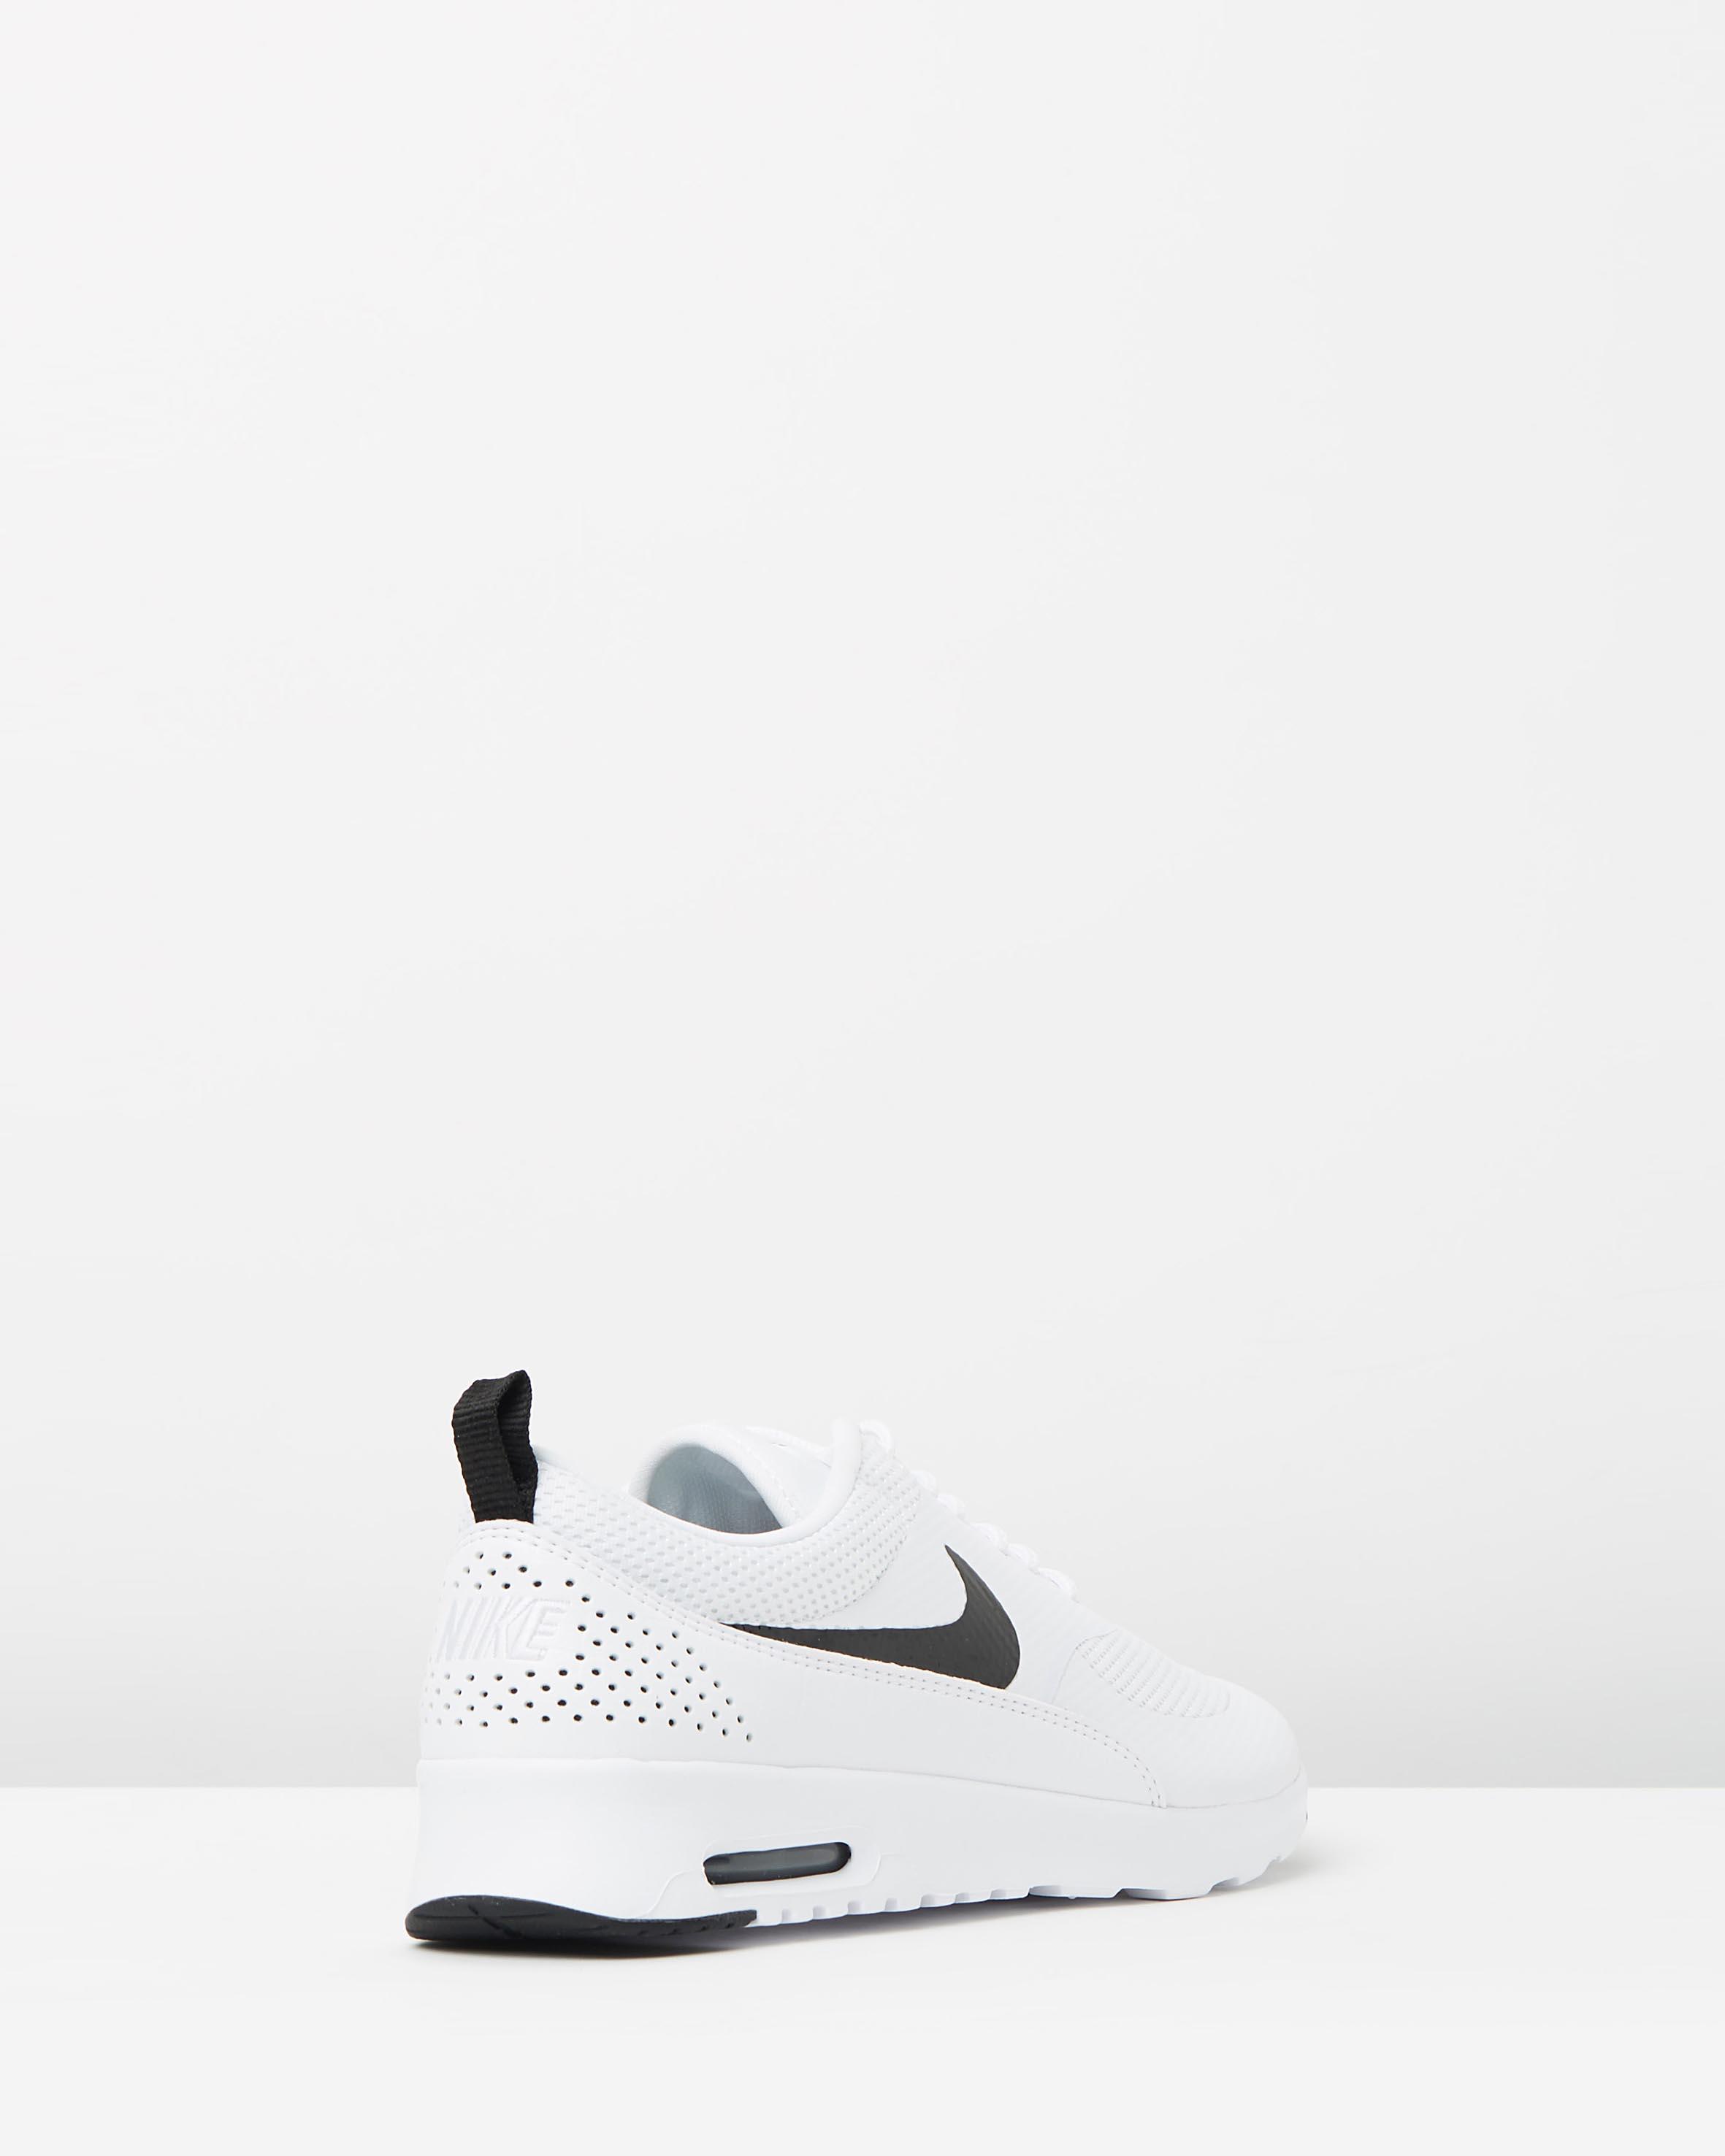 Michael Kors Sneakers Wit dames (KORS 351 white 43s9hpfs1L 085 Harper Lace Up )